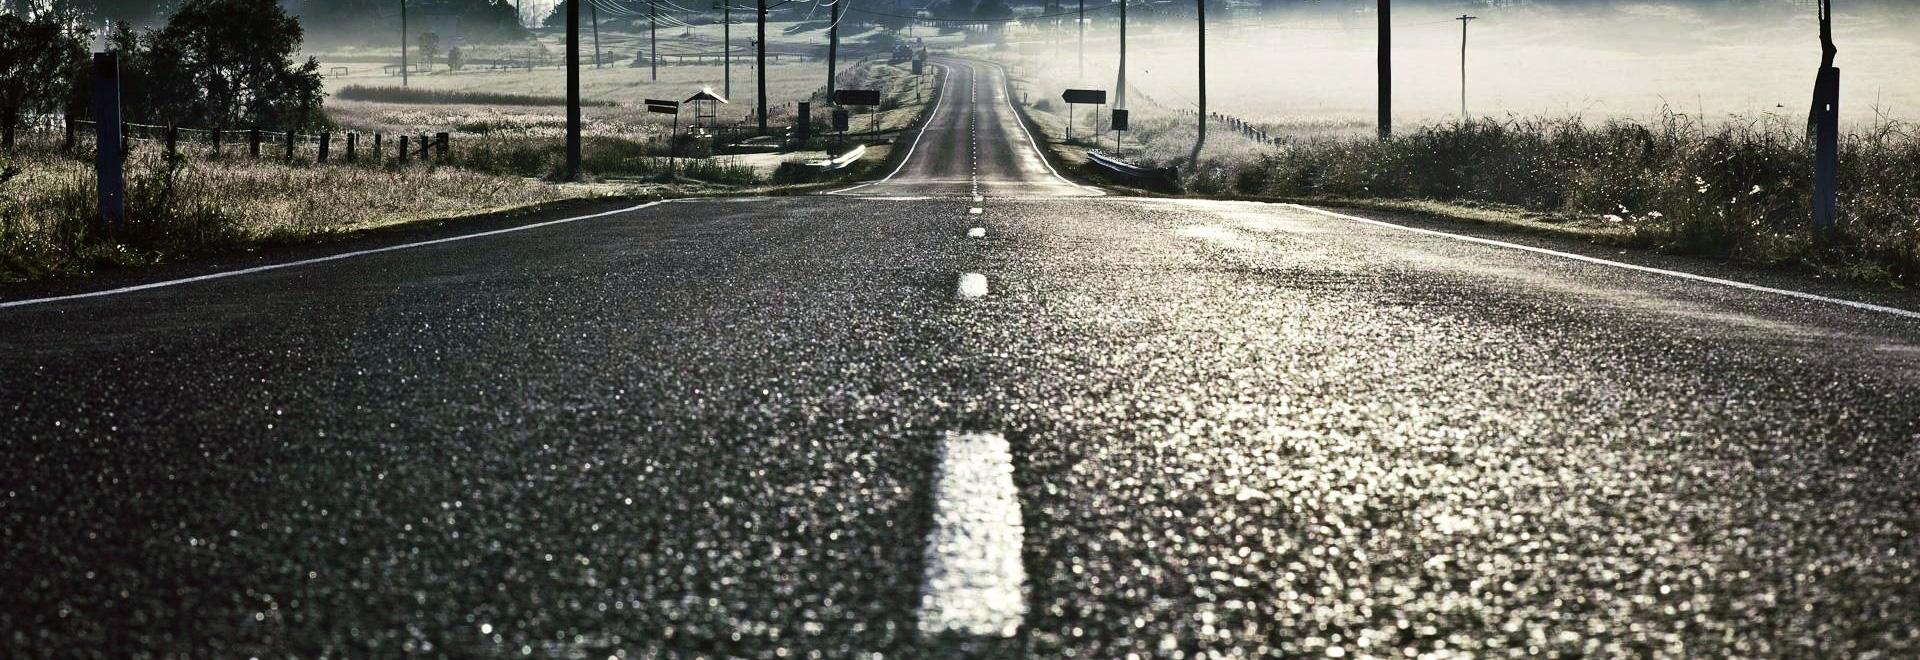 asphalt-slide-001